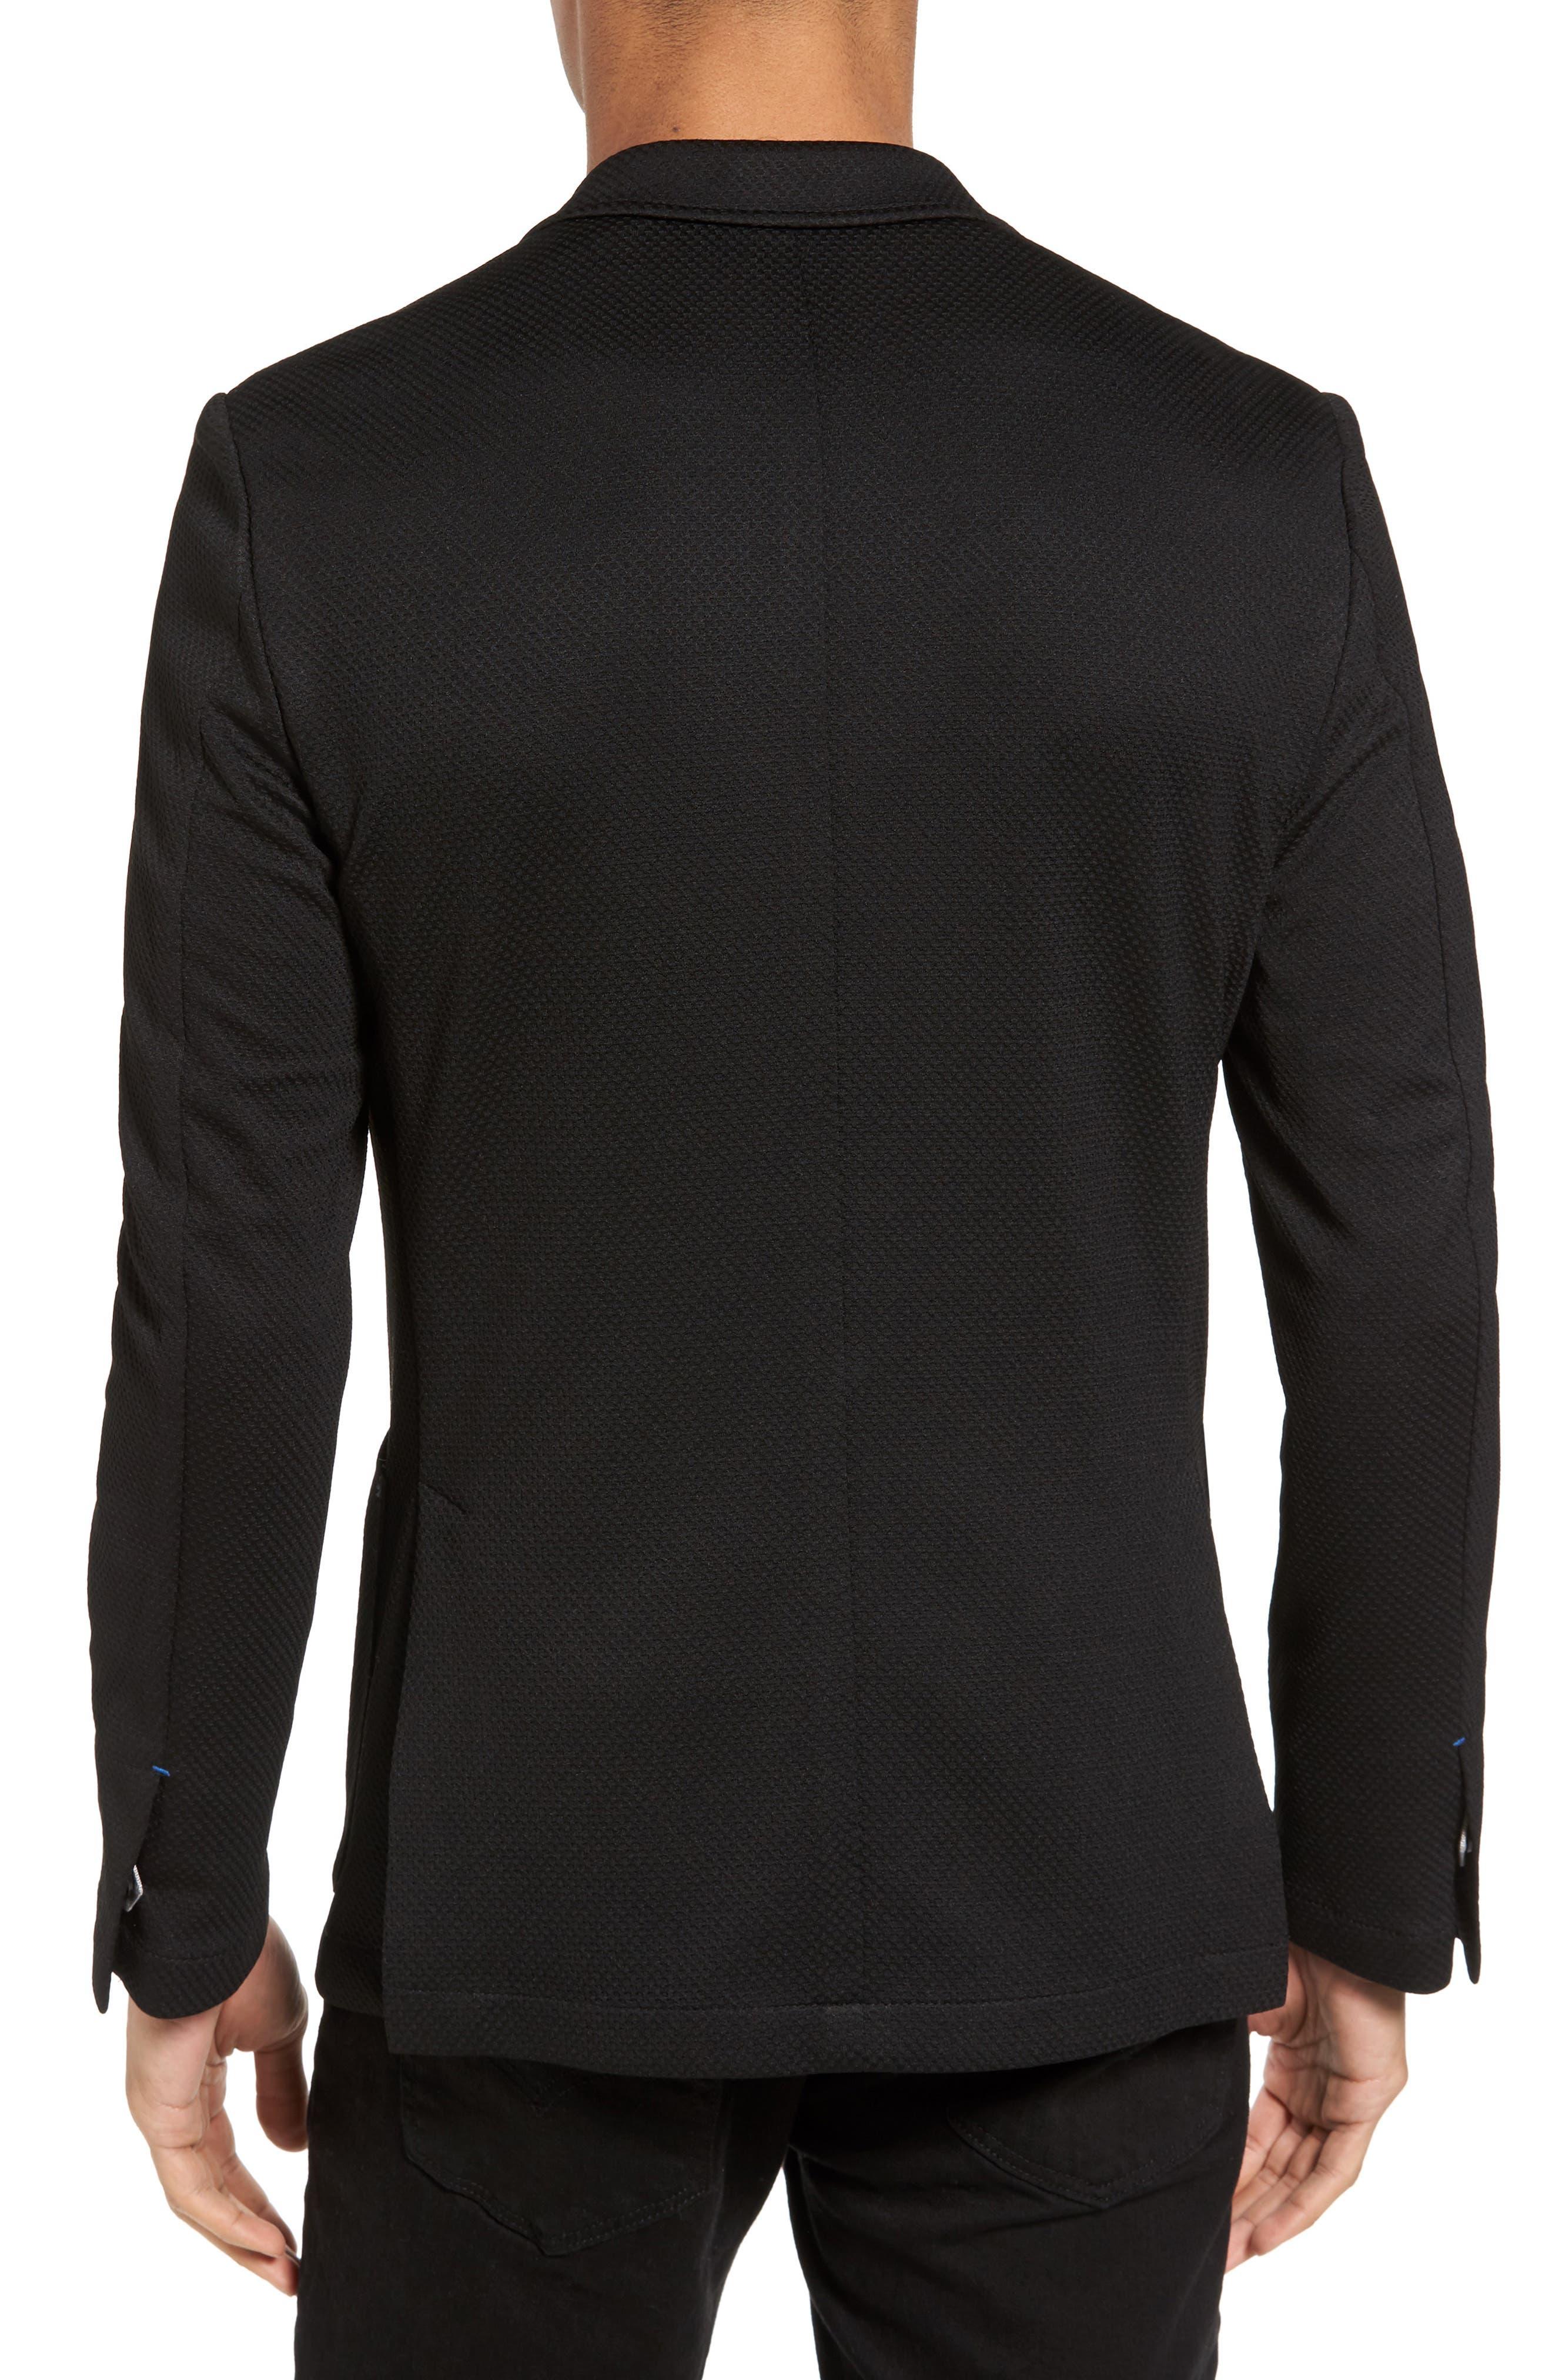 Mens jacket button rules - Mens Jacket Button Rules 58